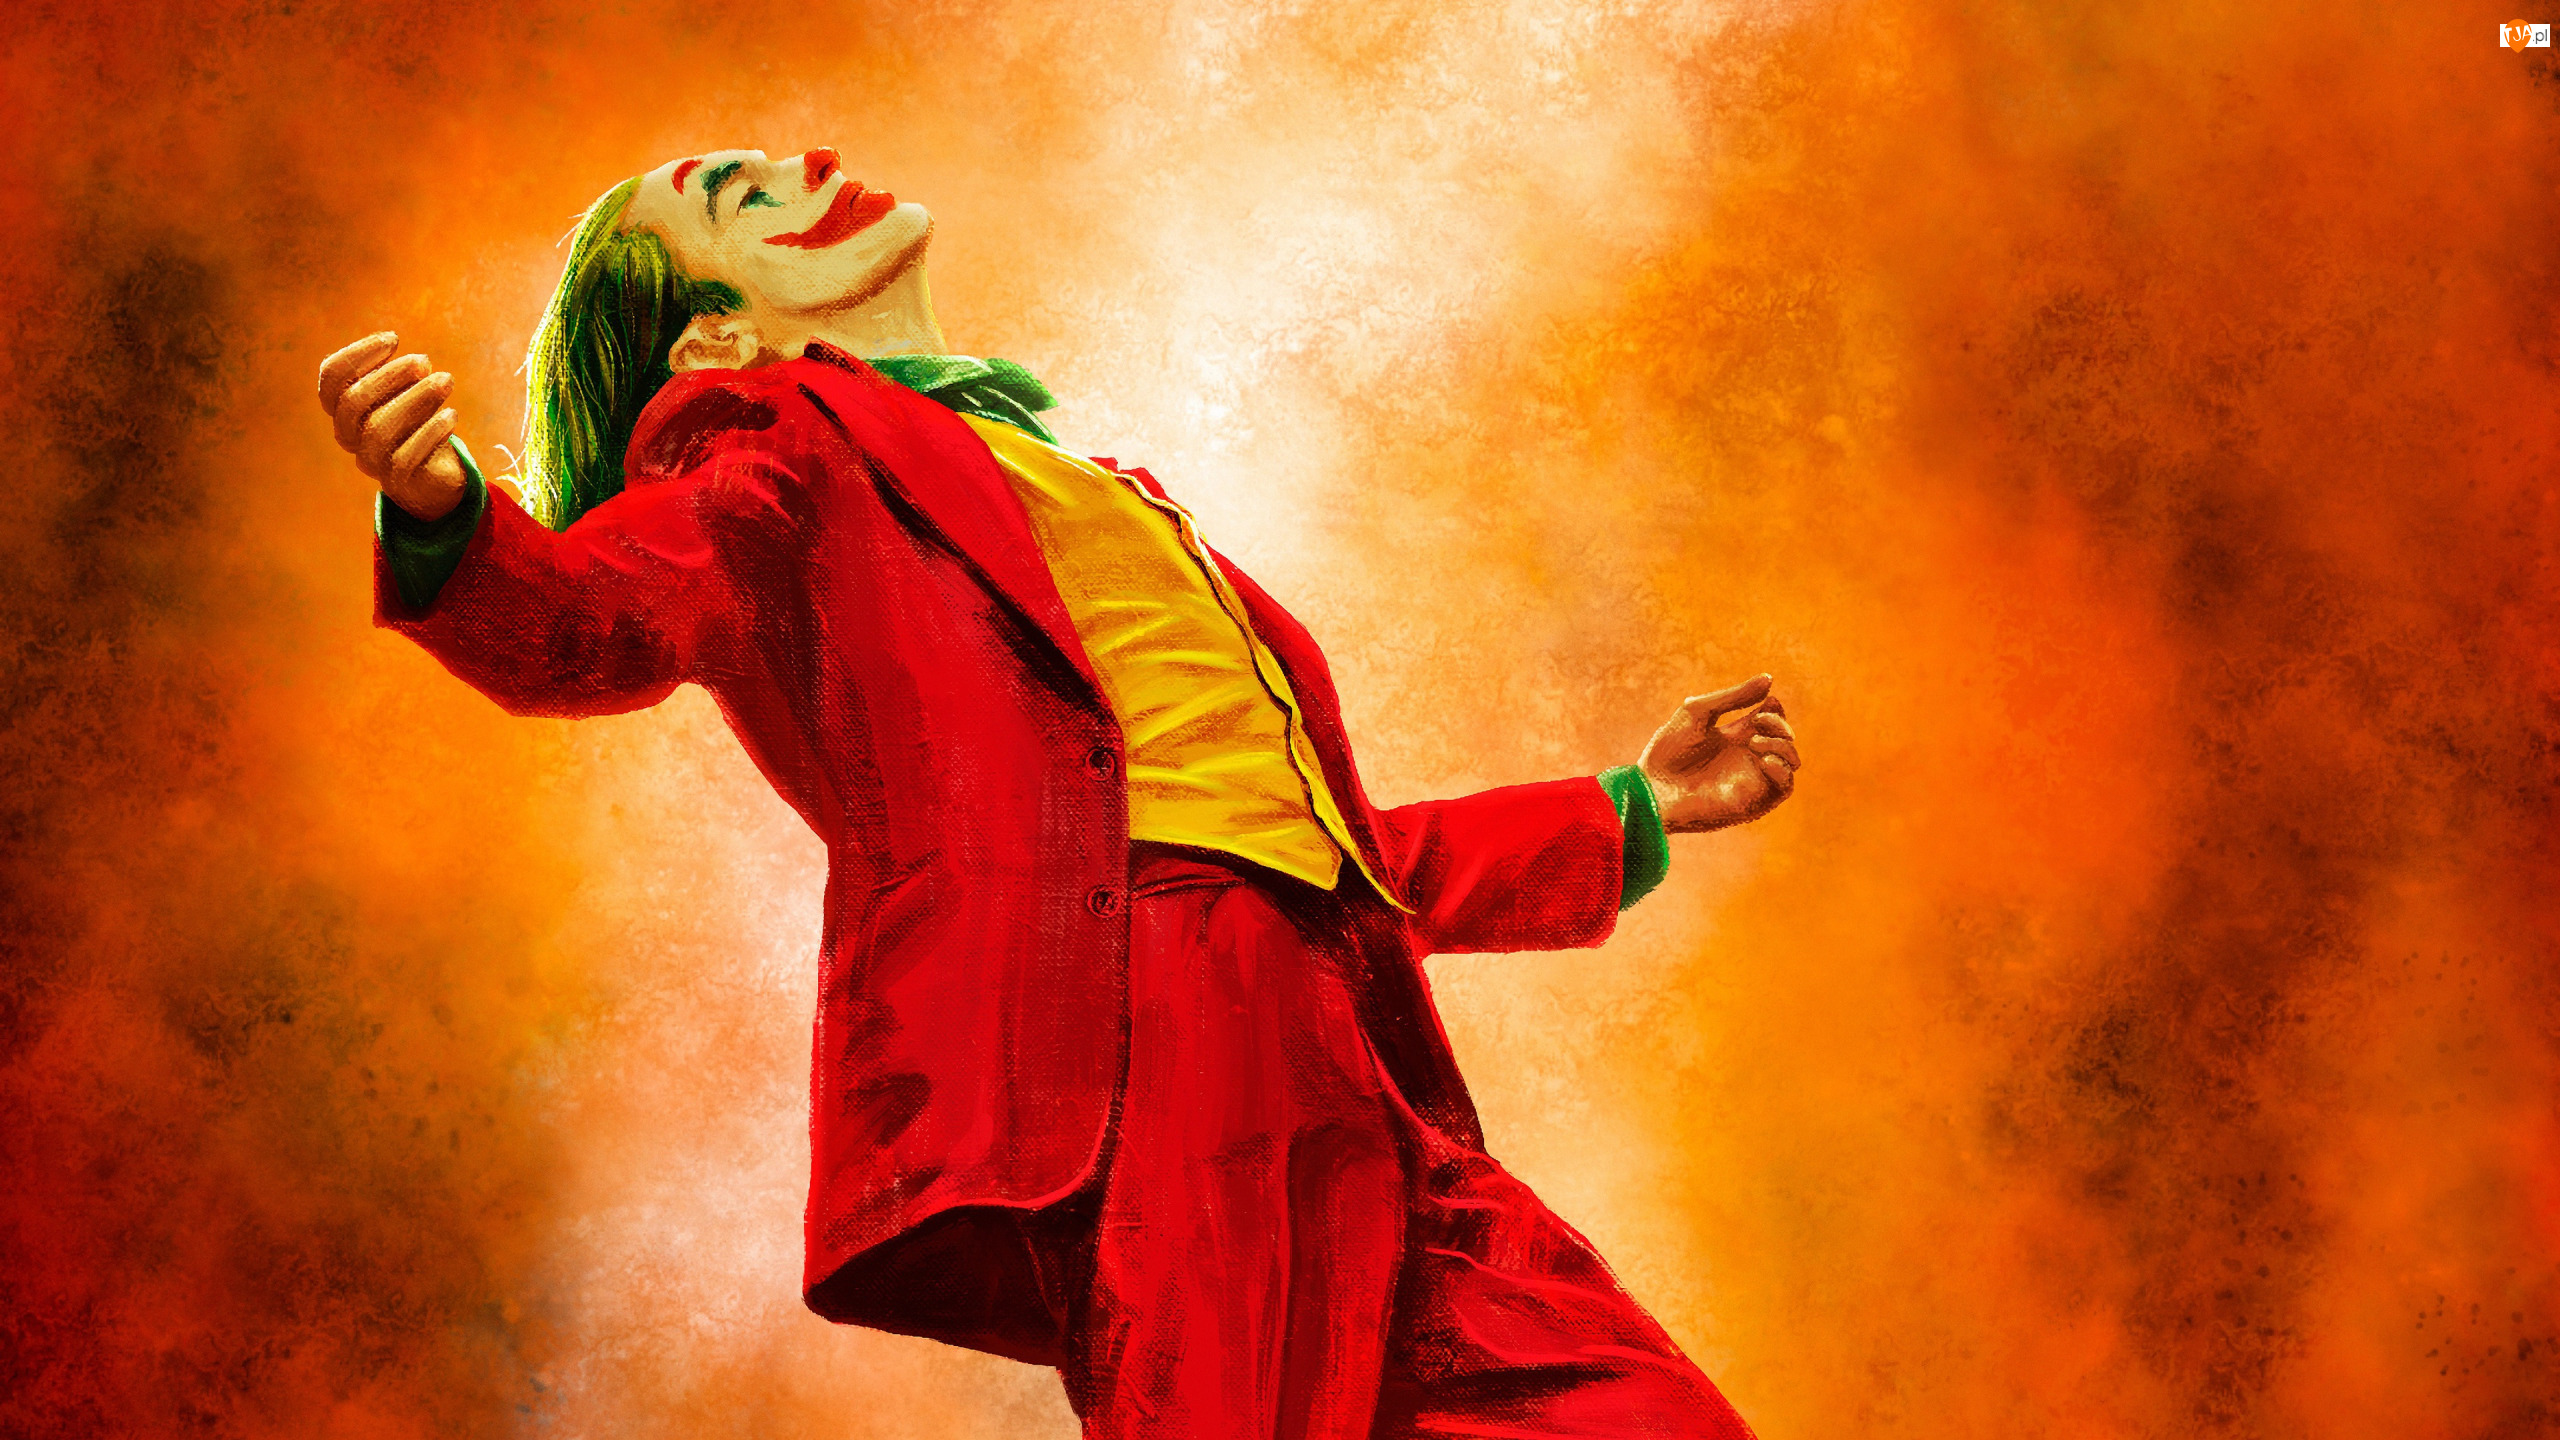 Paintography, Film, Joker